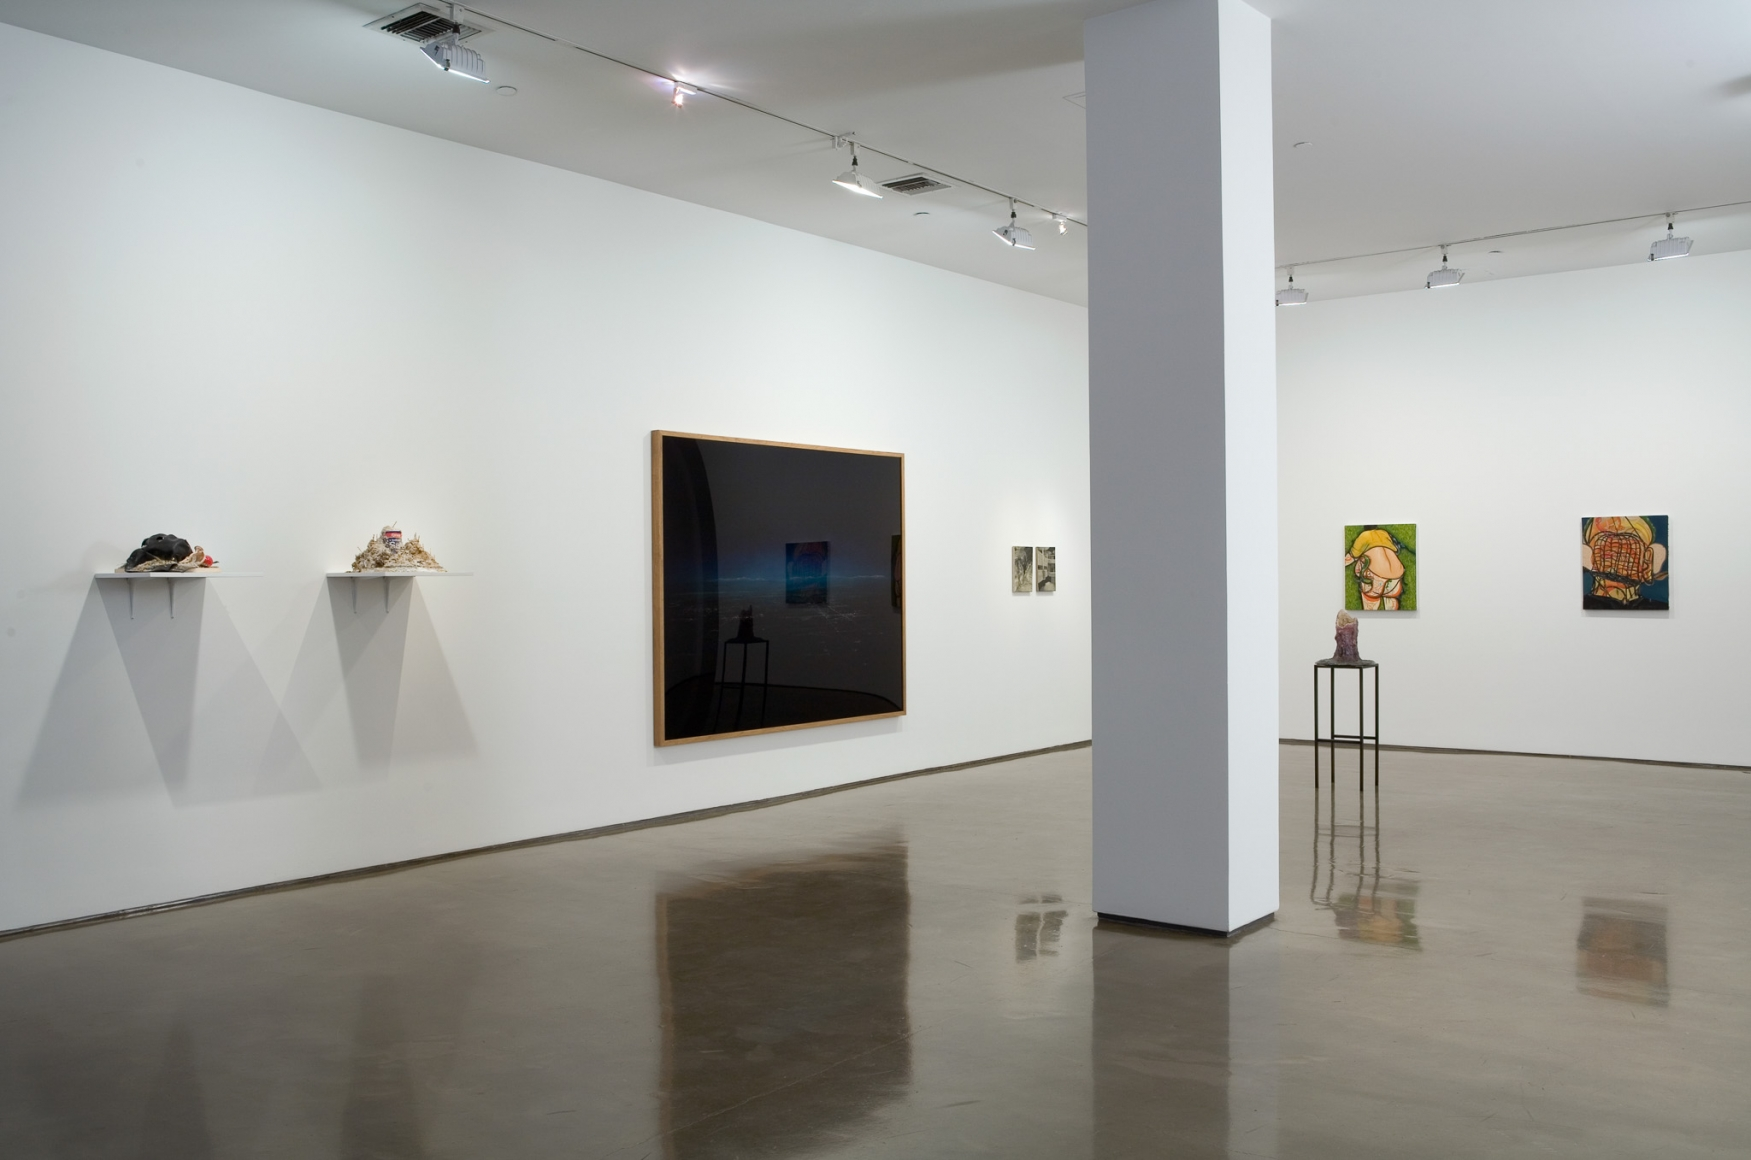 303 Gallery New York June 2